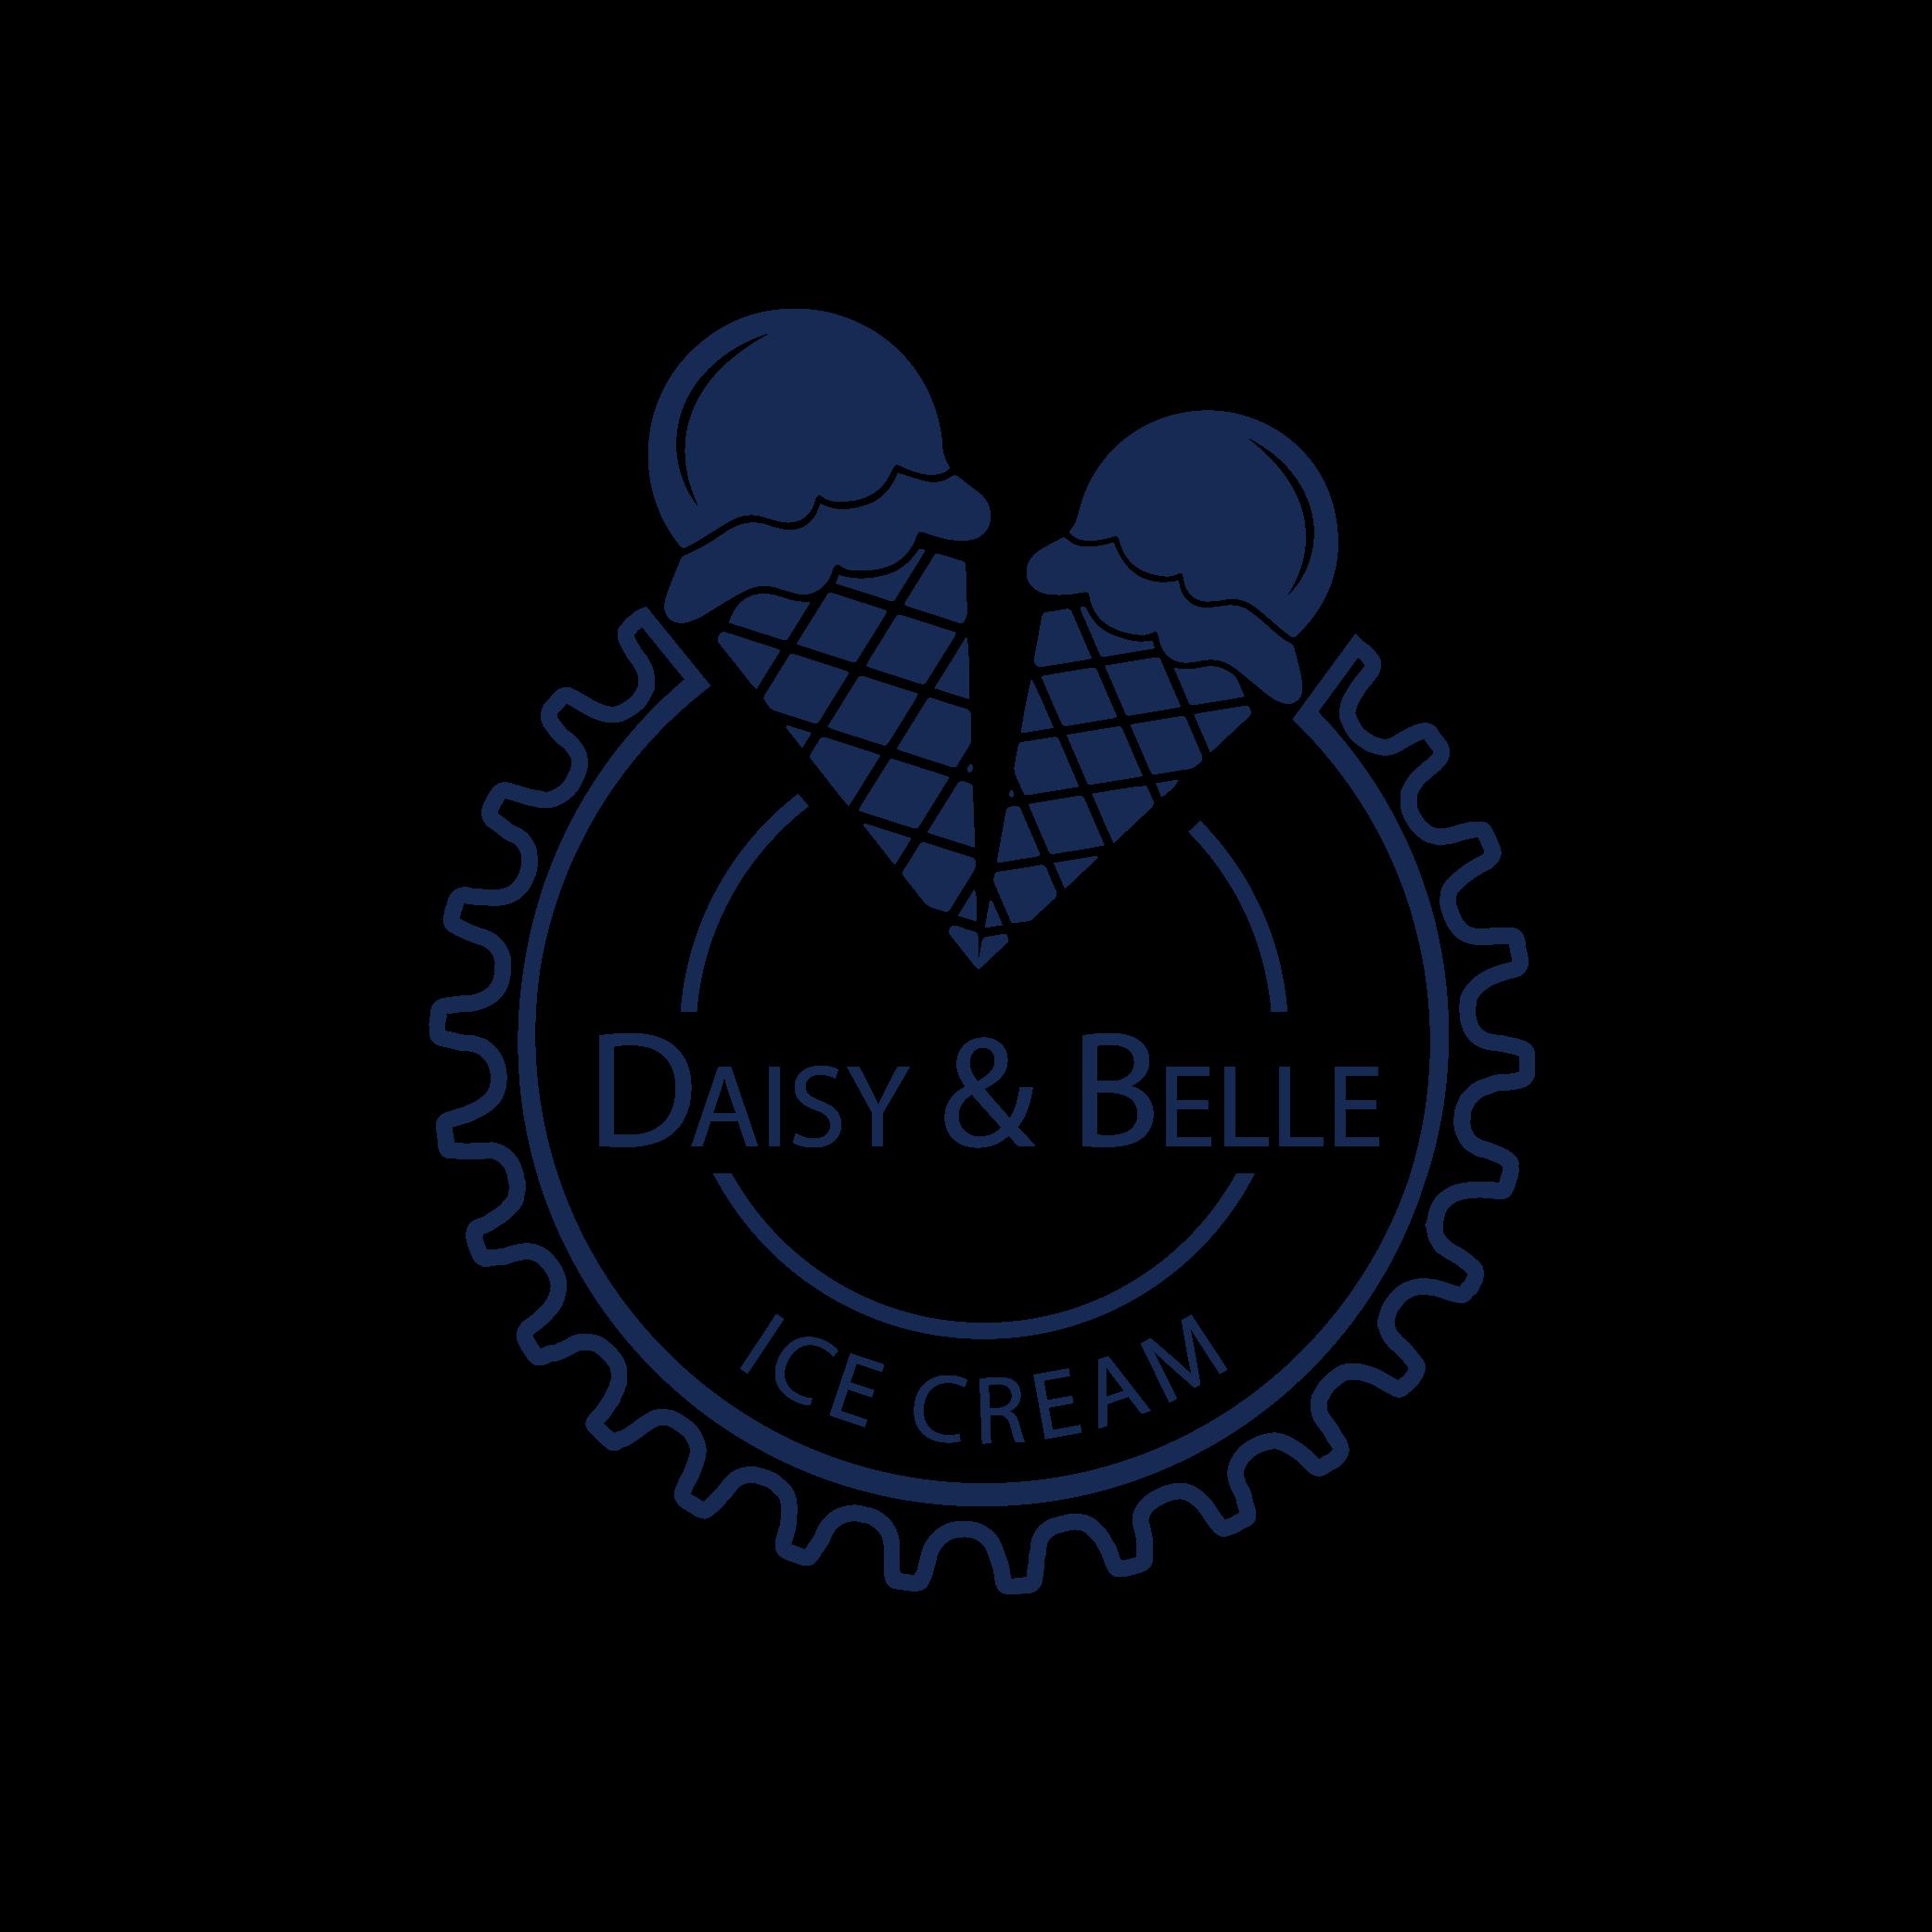 Daisy & Belle Ice Cream